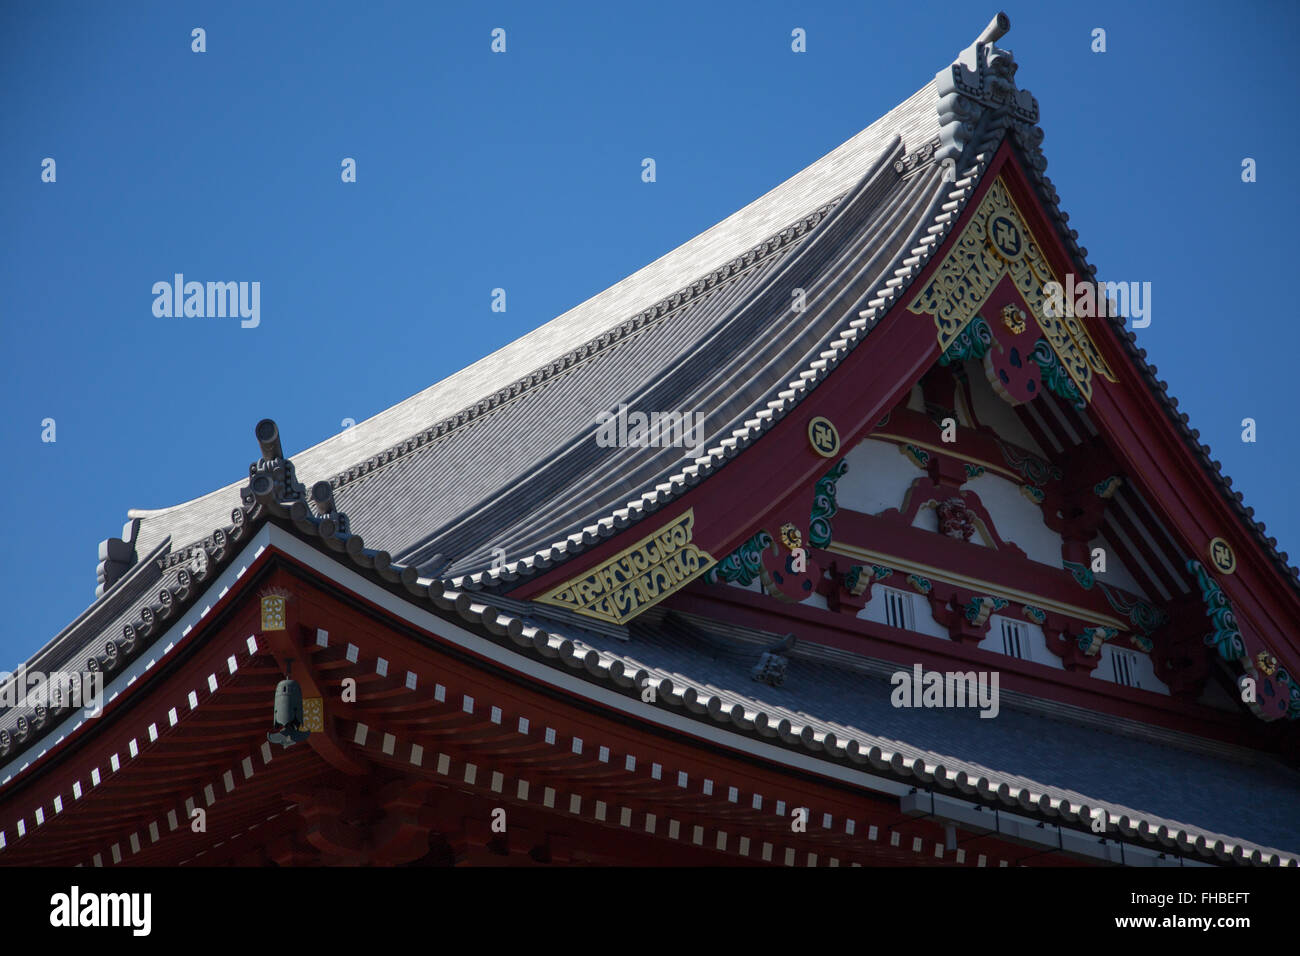 Templo japonés en Asakusa Tokio JAPÓN Imagen De Stock